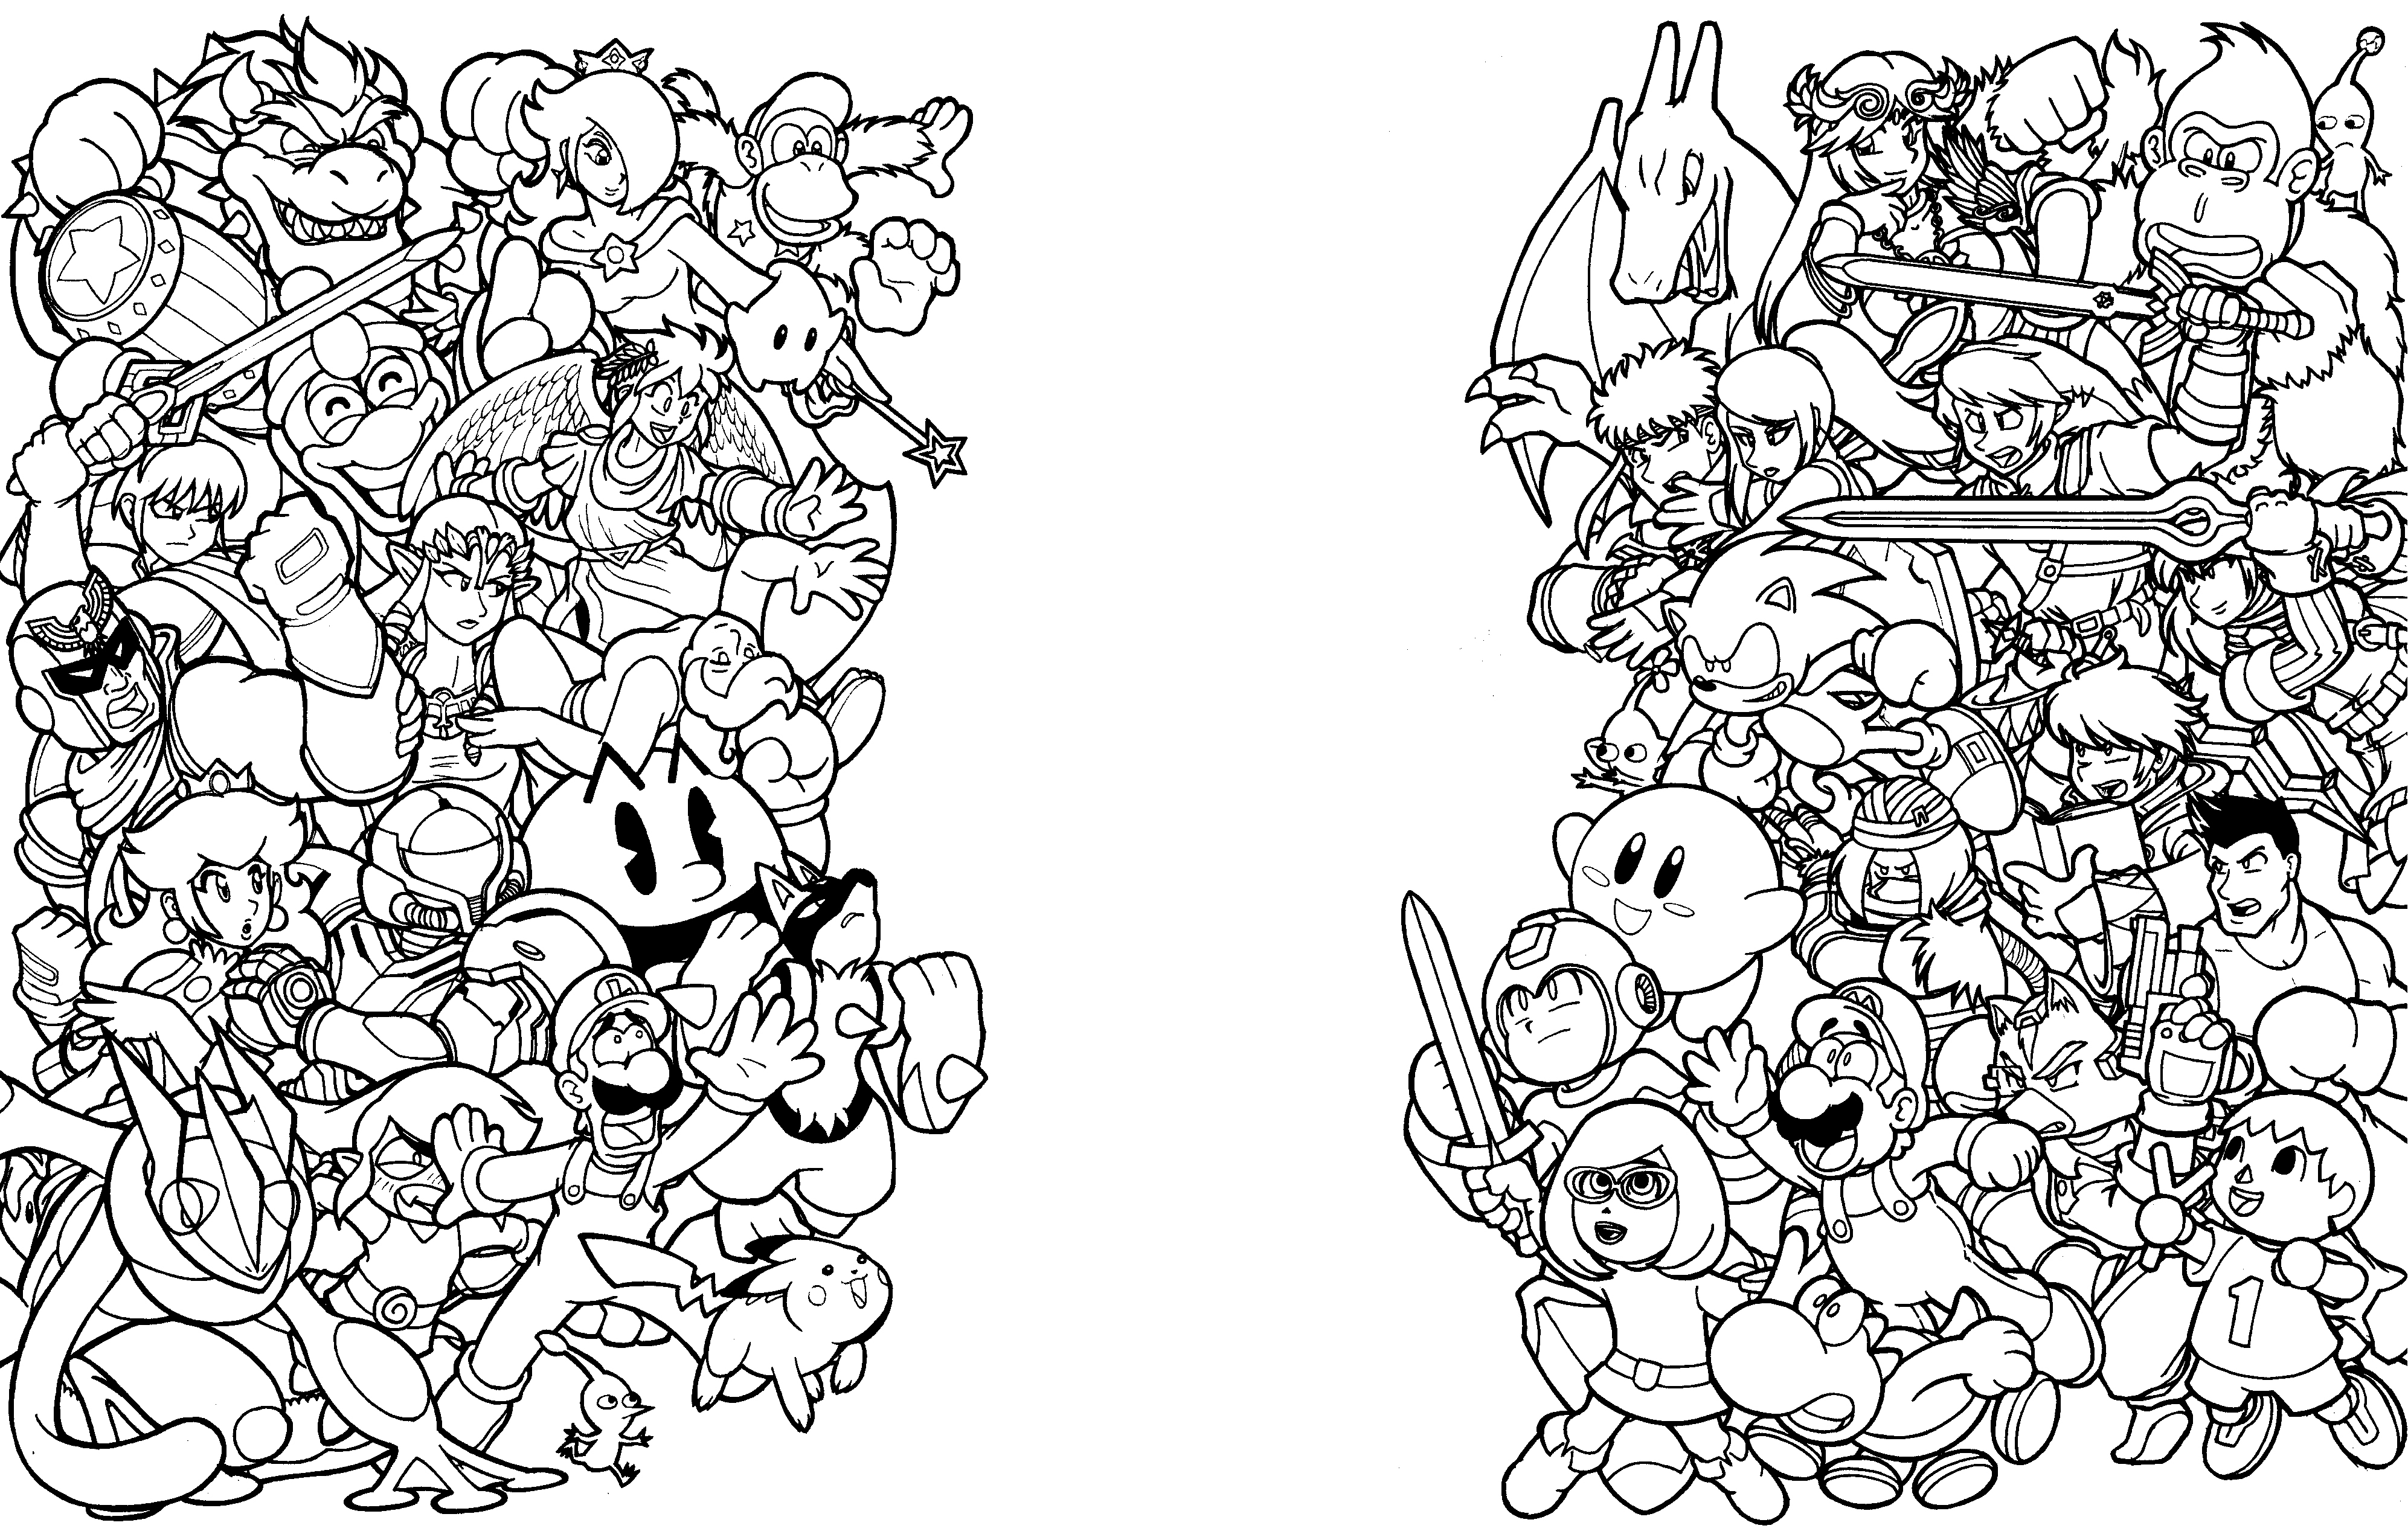 Dibujos De Super Mario Para Colorear E Imprimir 2: Super Smash Bros Para Colorear